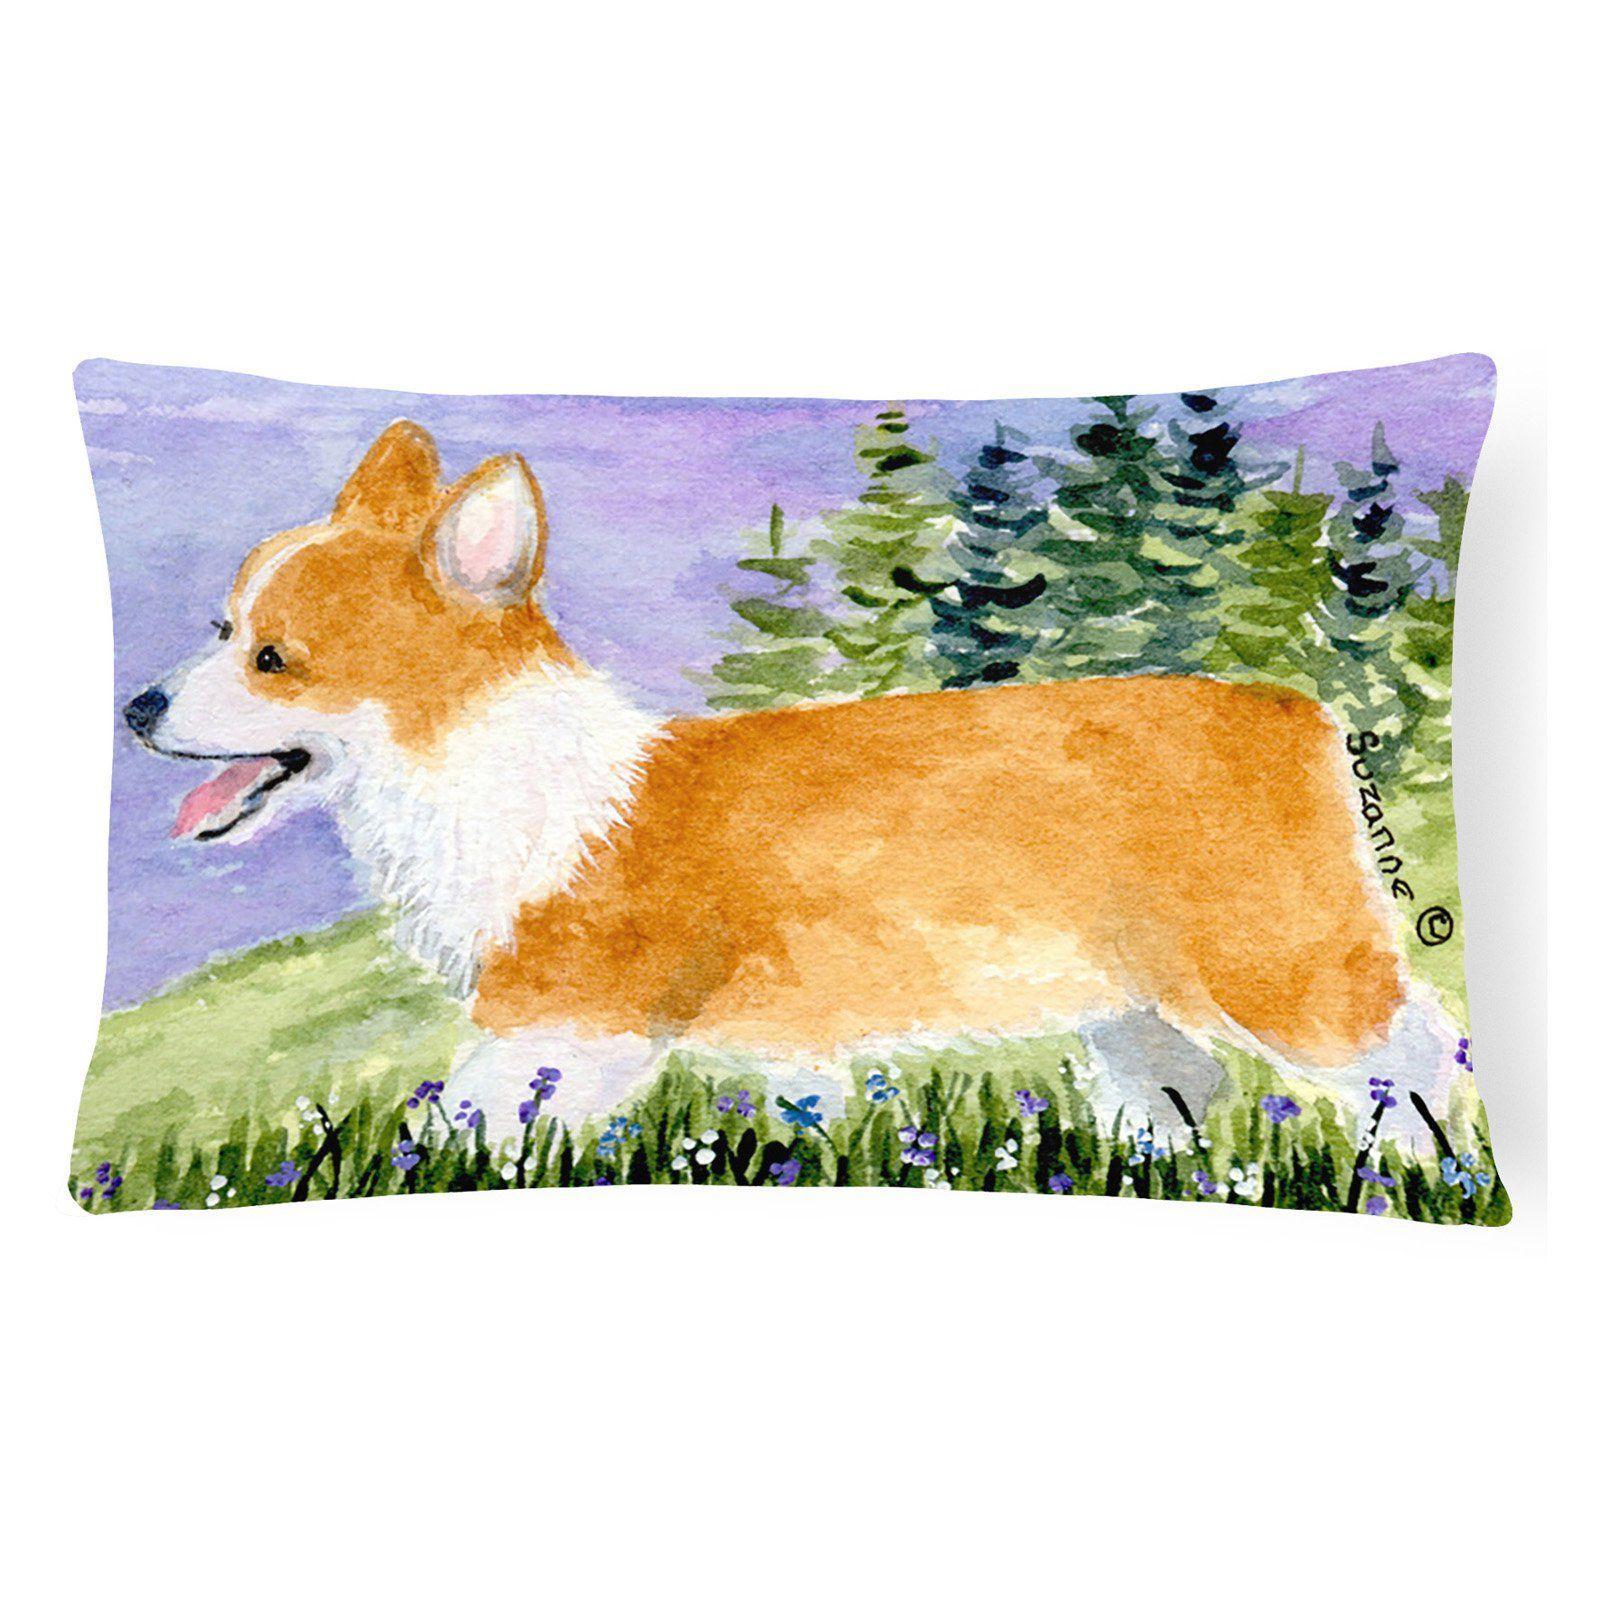 Carolines Treasures Corgi Dog on Purple Decorative Outdoor Pillow - SS8912PW1216